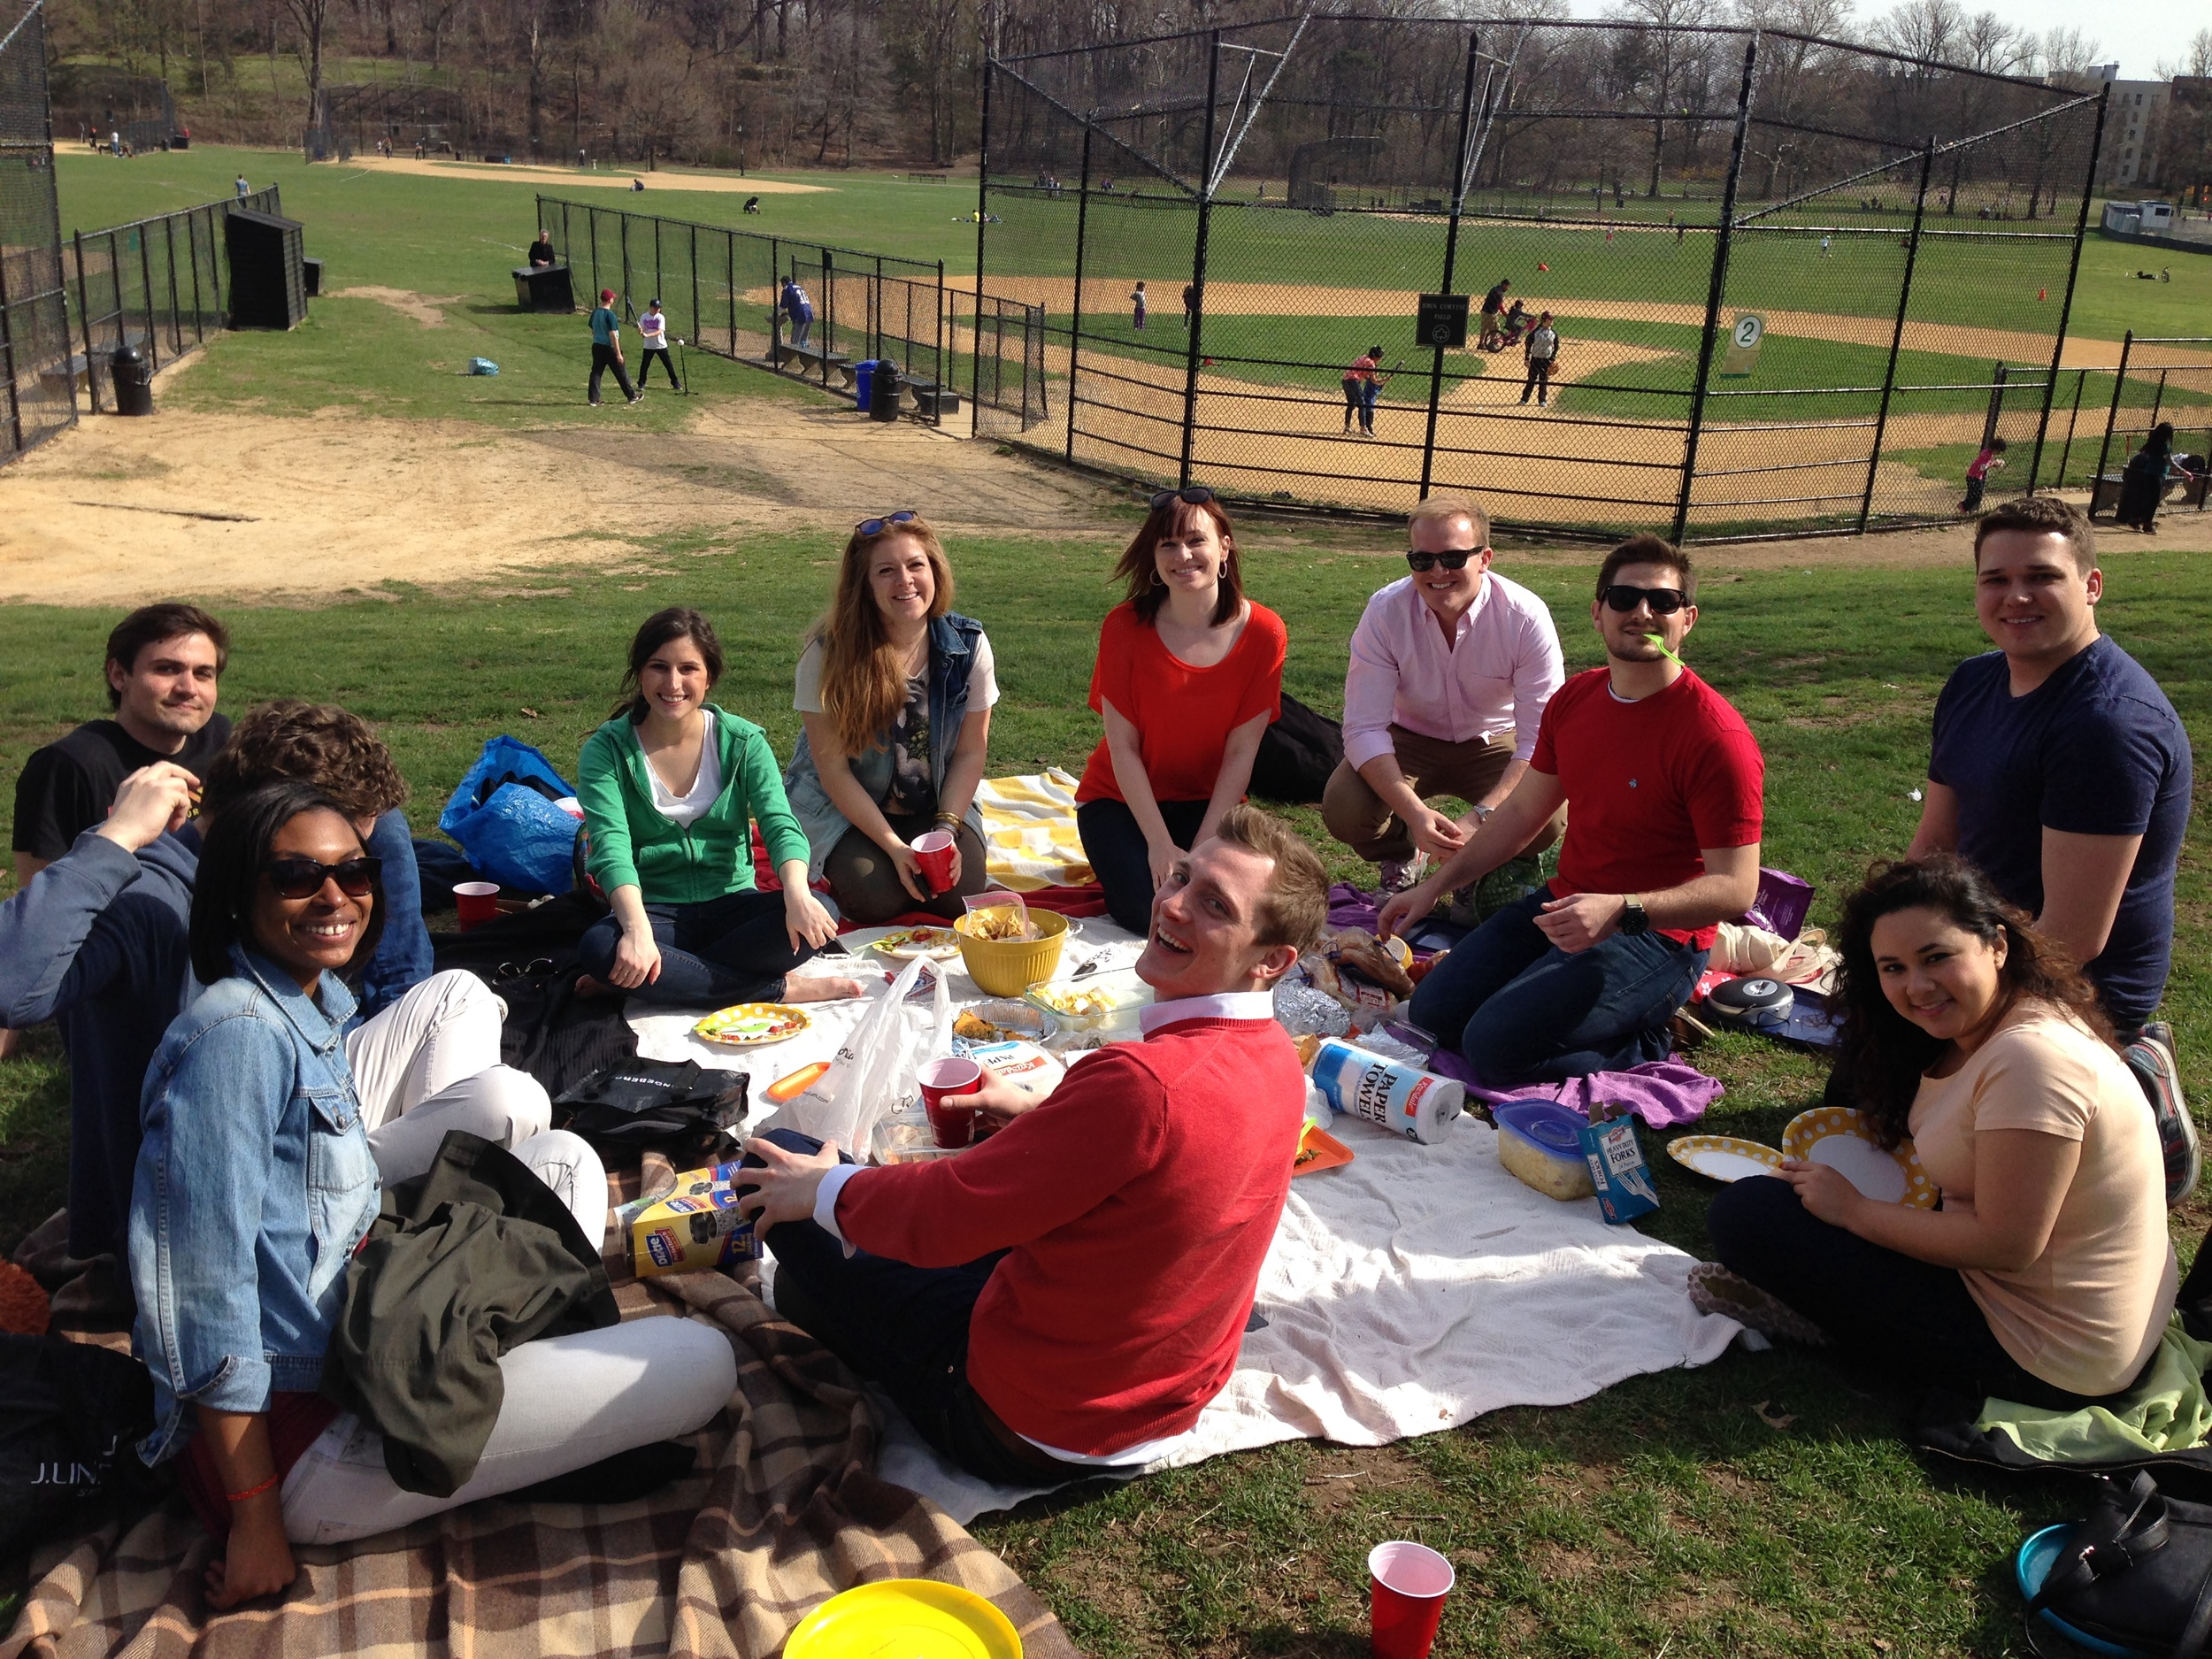 Easter celebration in the park